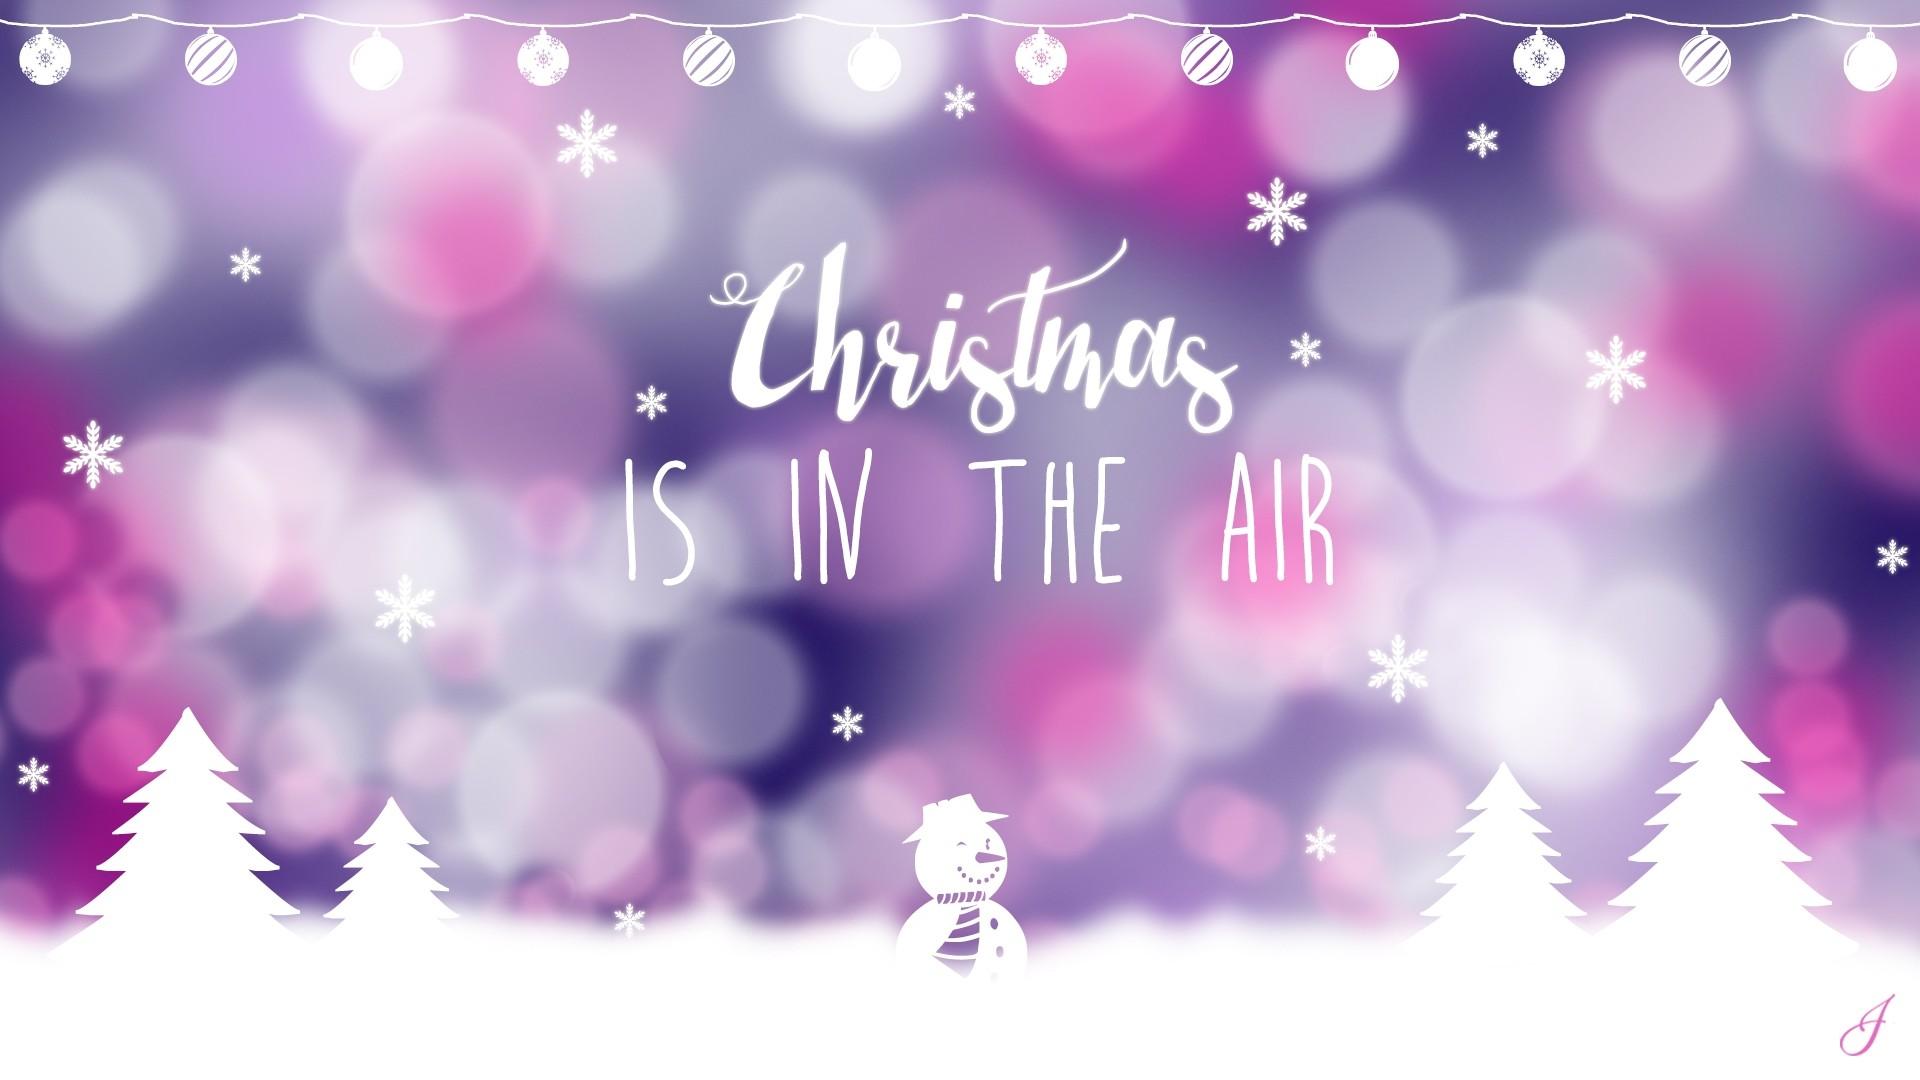 Aesthetic Christmas hd desktop wallpaper